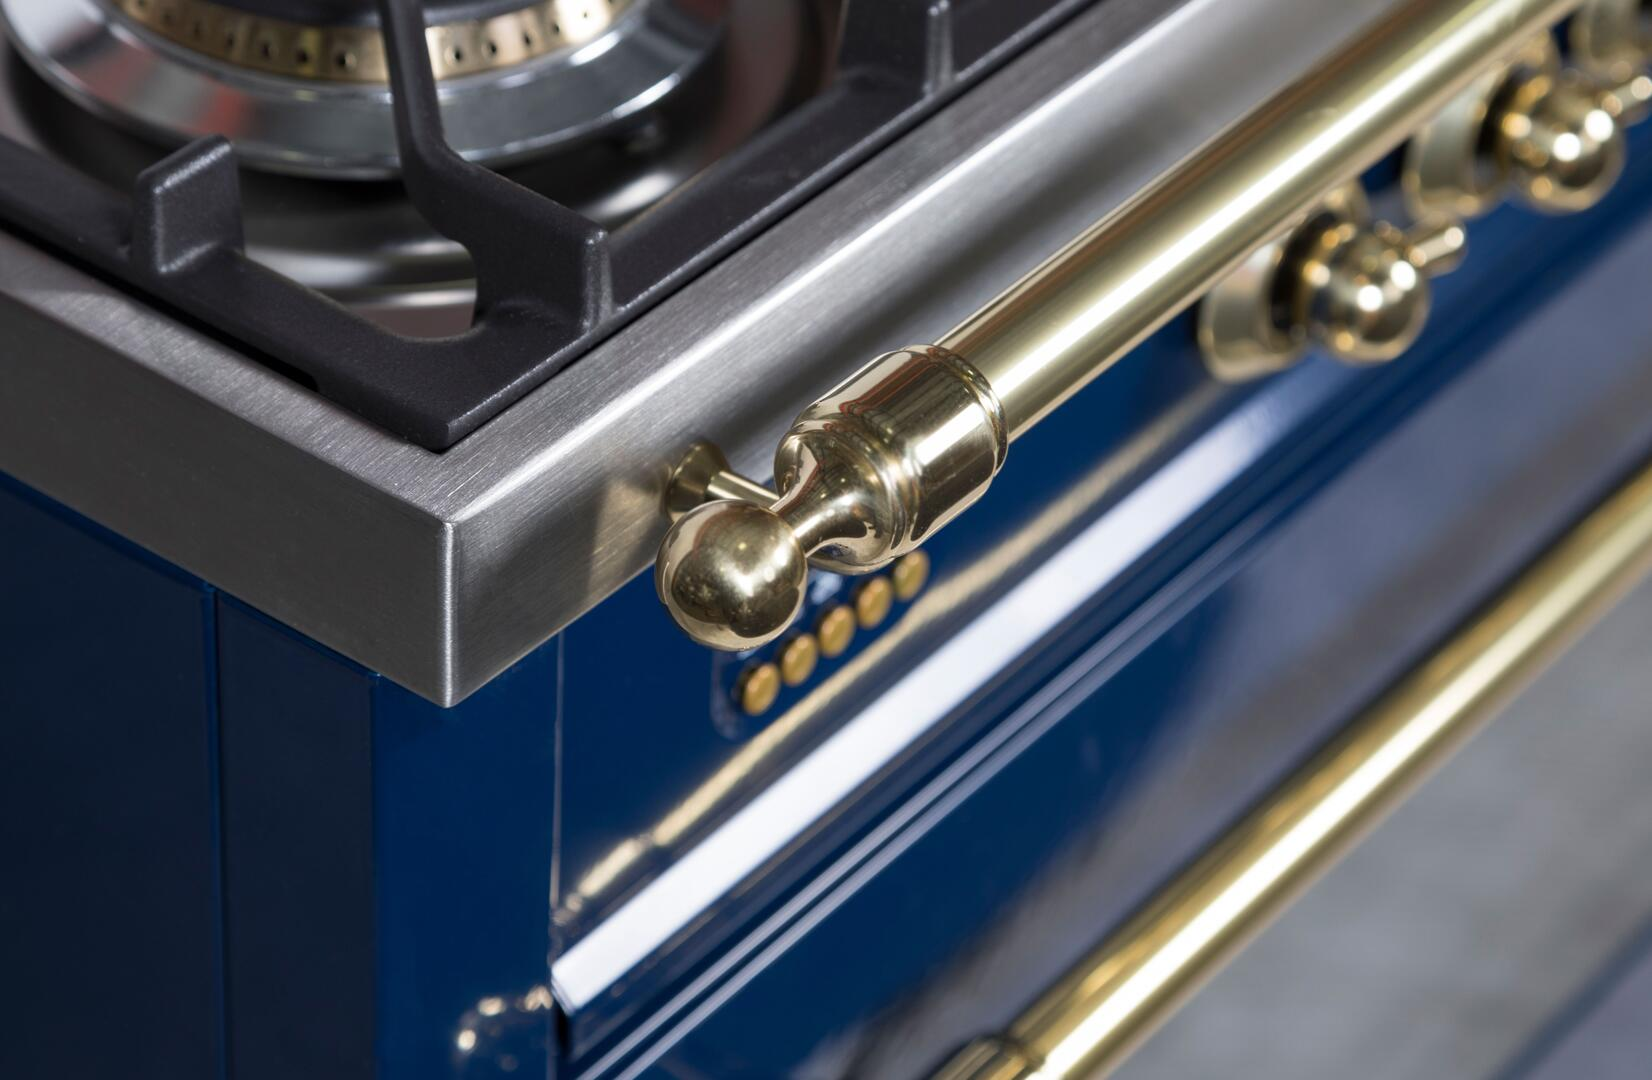 Ilve Nostalgie UPN90FDMPBL Freestanding Dual Fuel Range Blue, ILVE UPN90FDMPBL Range Lifestyle